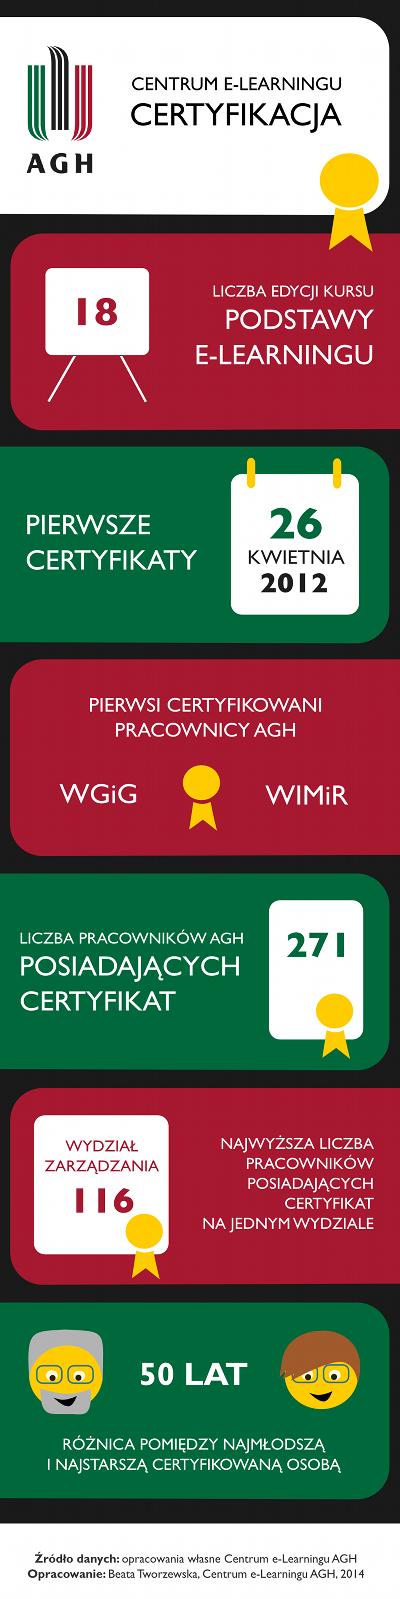 final_infografika_0001_400